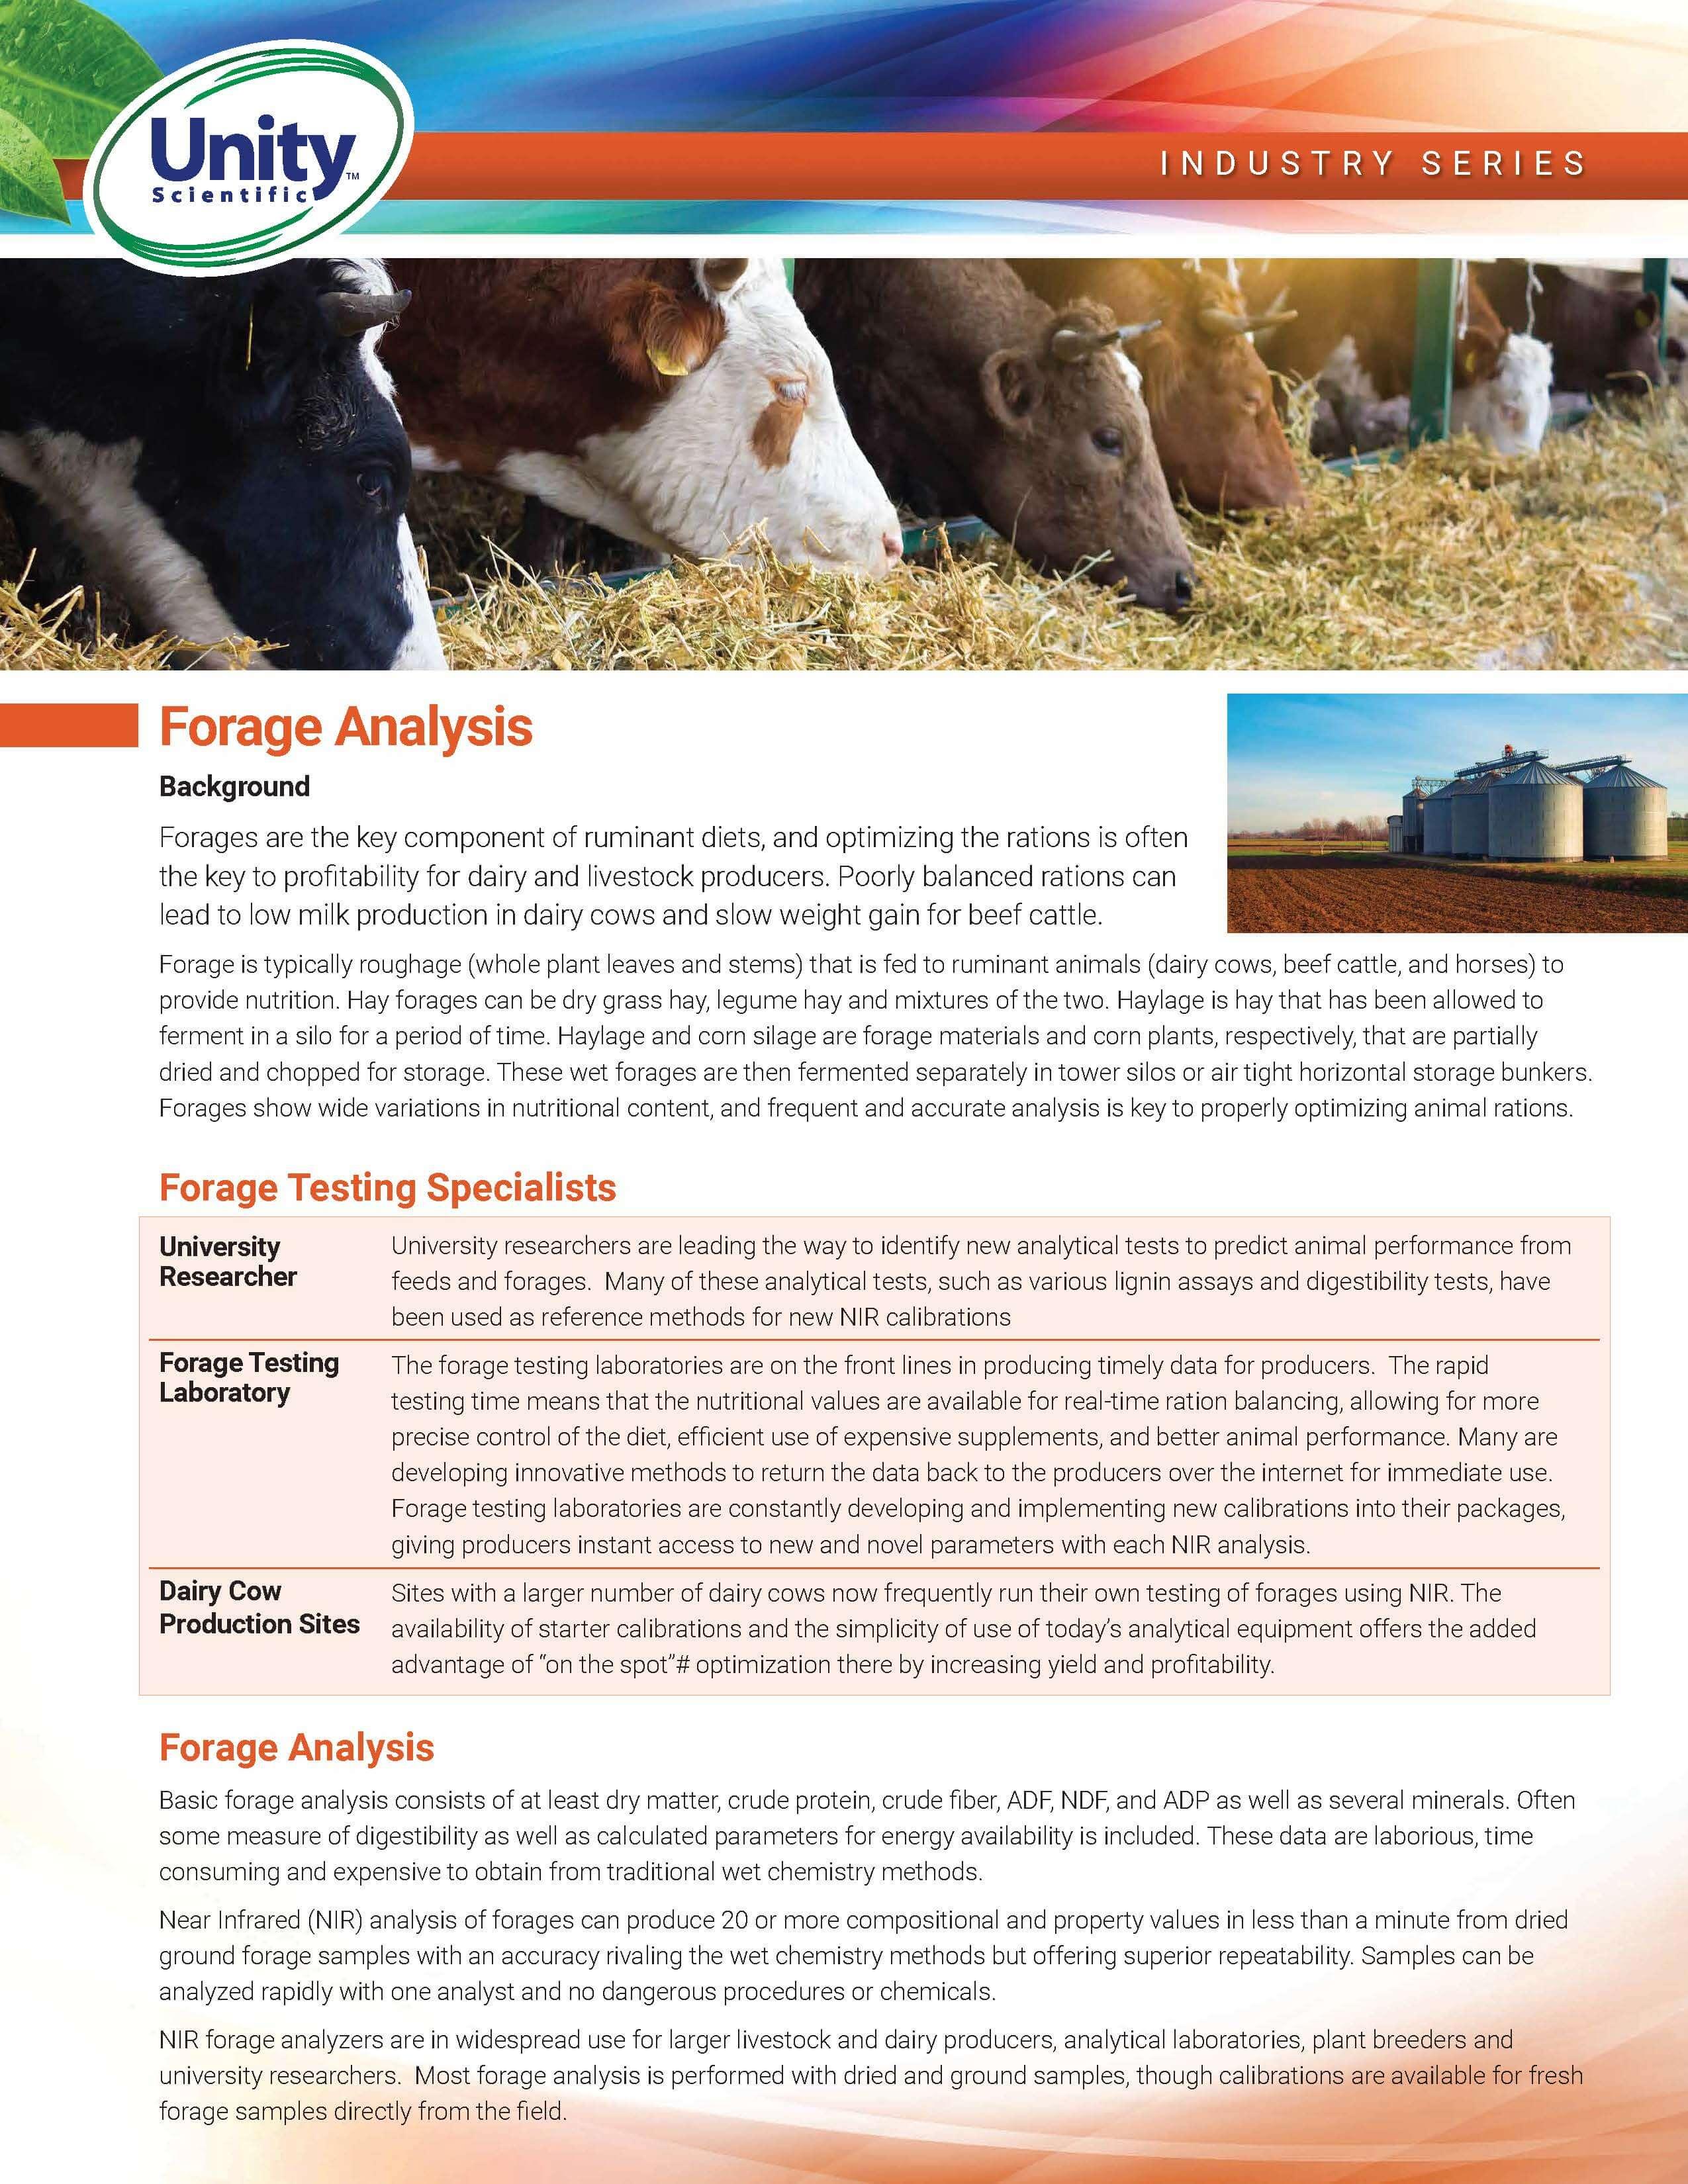 Industry Series - Forage Analysis